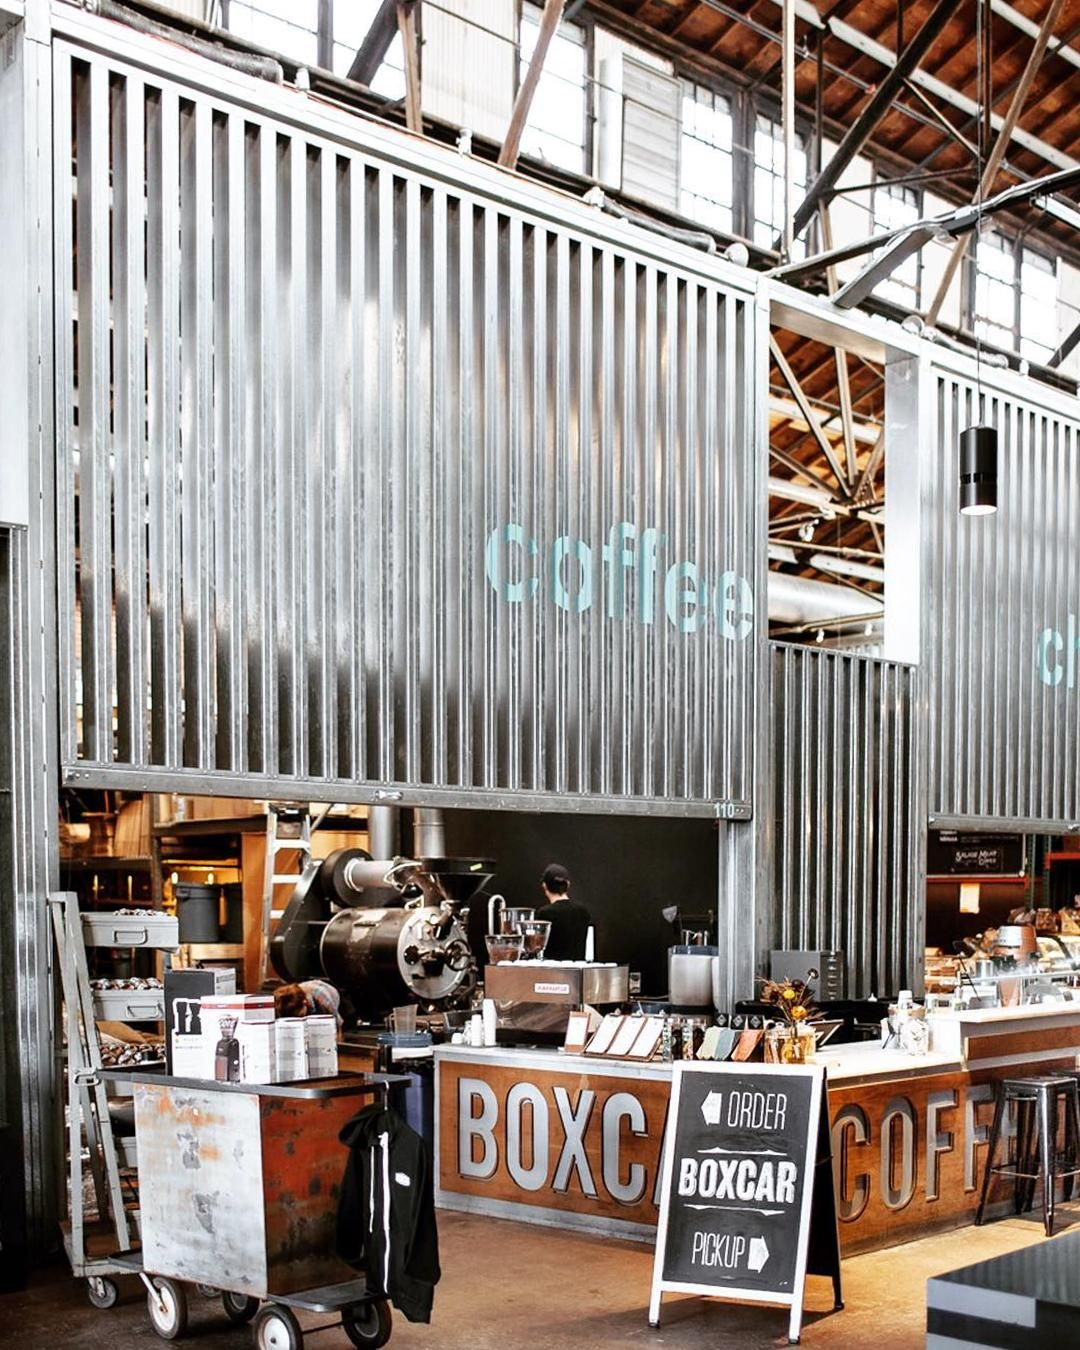 14 of the best coffee shops around denver colorado best